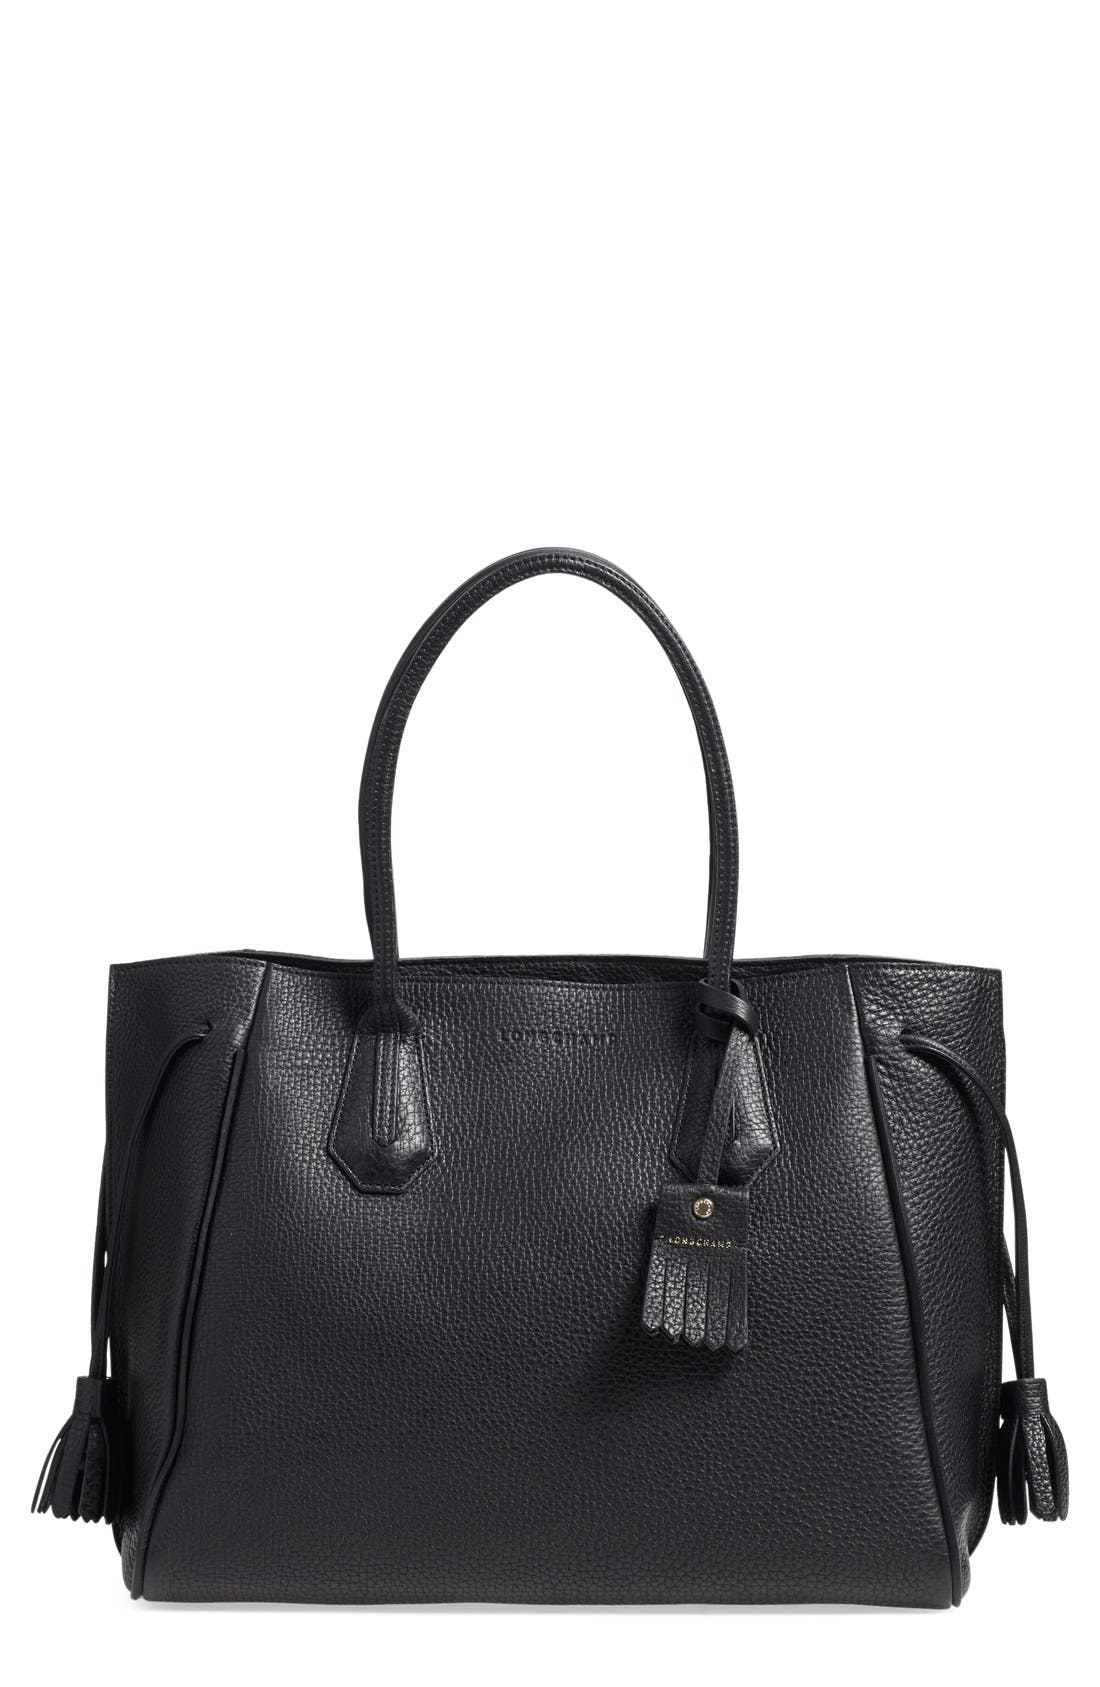 Main Image - Longchamp 'Penelope' Tassel Drawstring Leather Tote